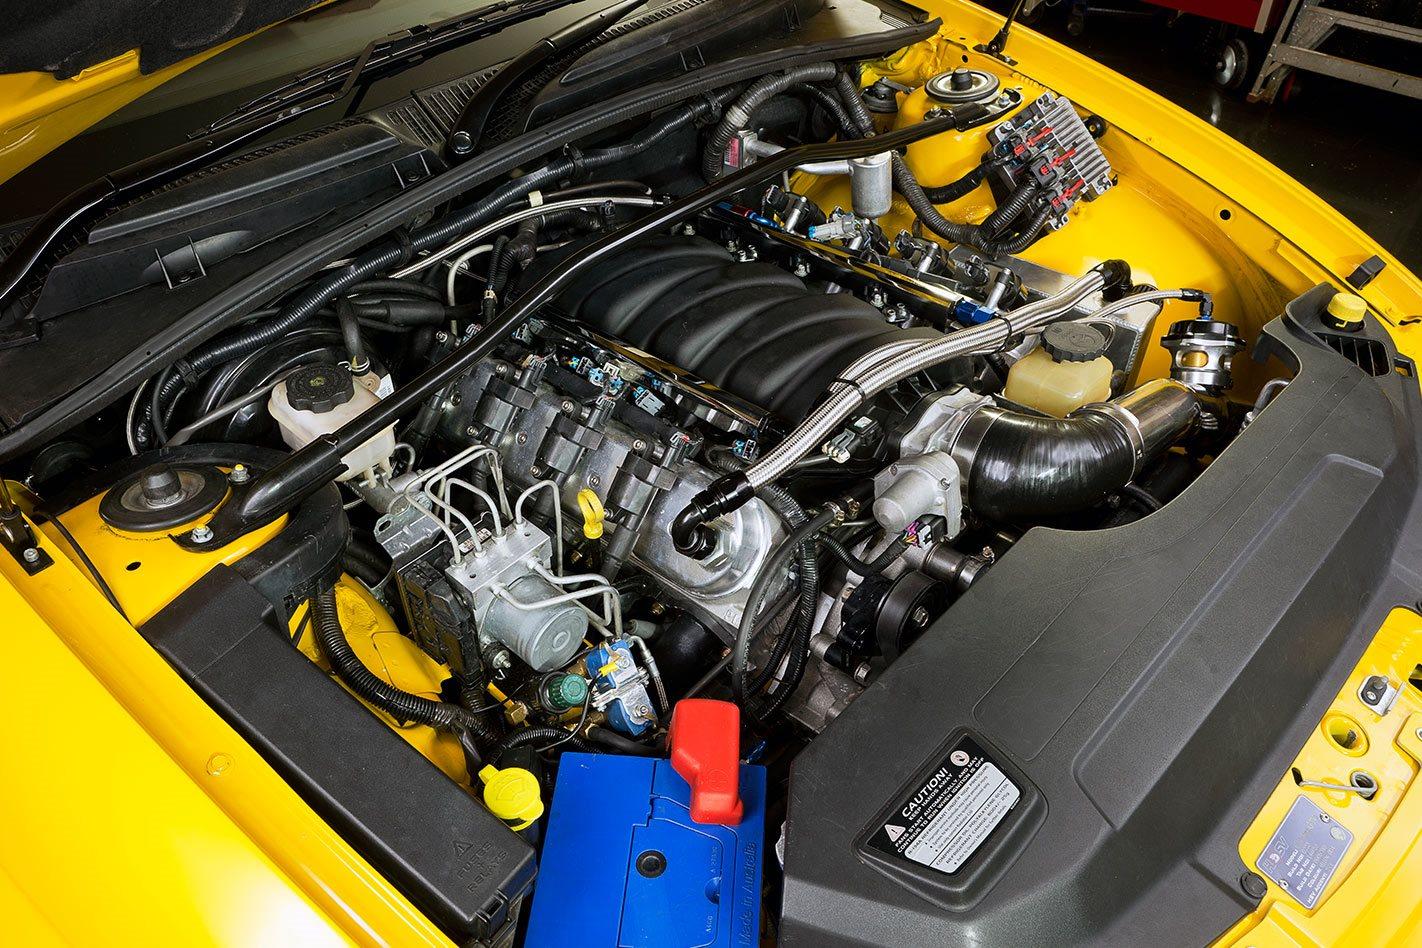 VZ HSV GTO engine bay